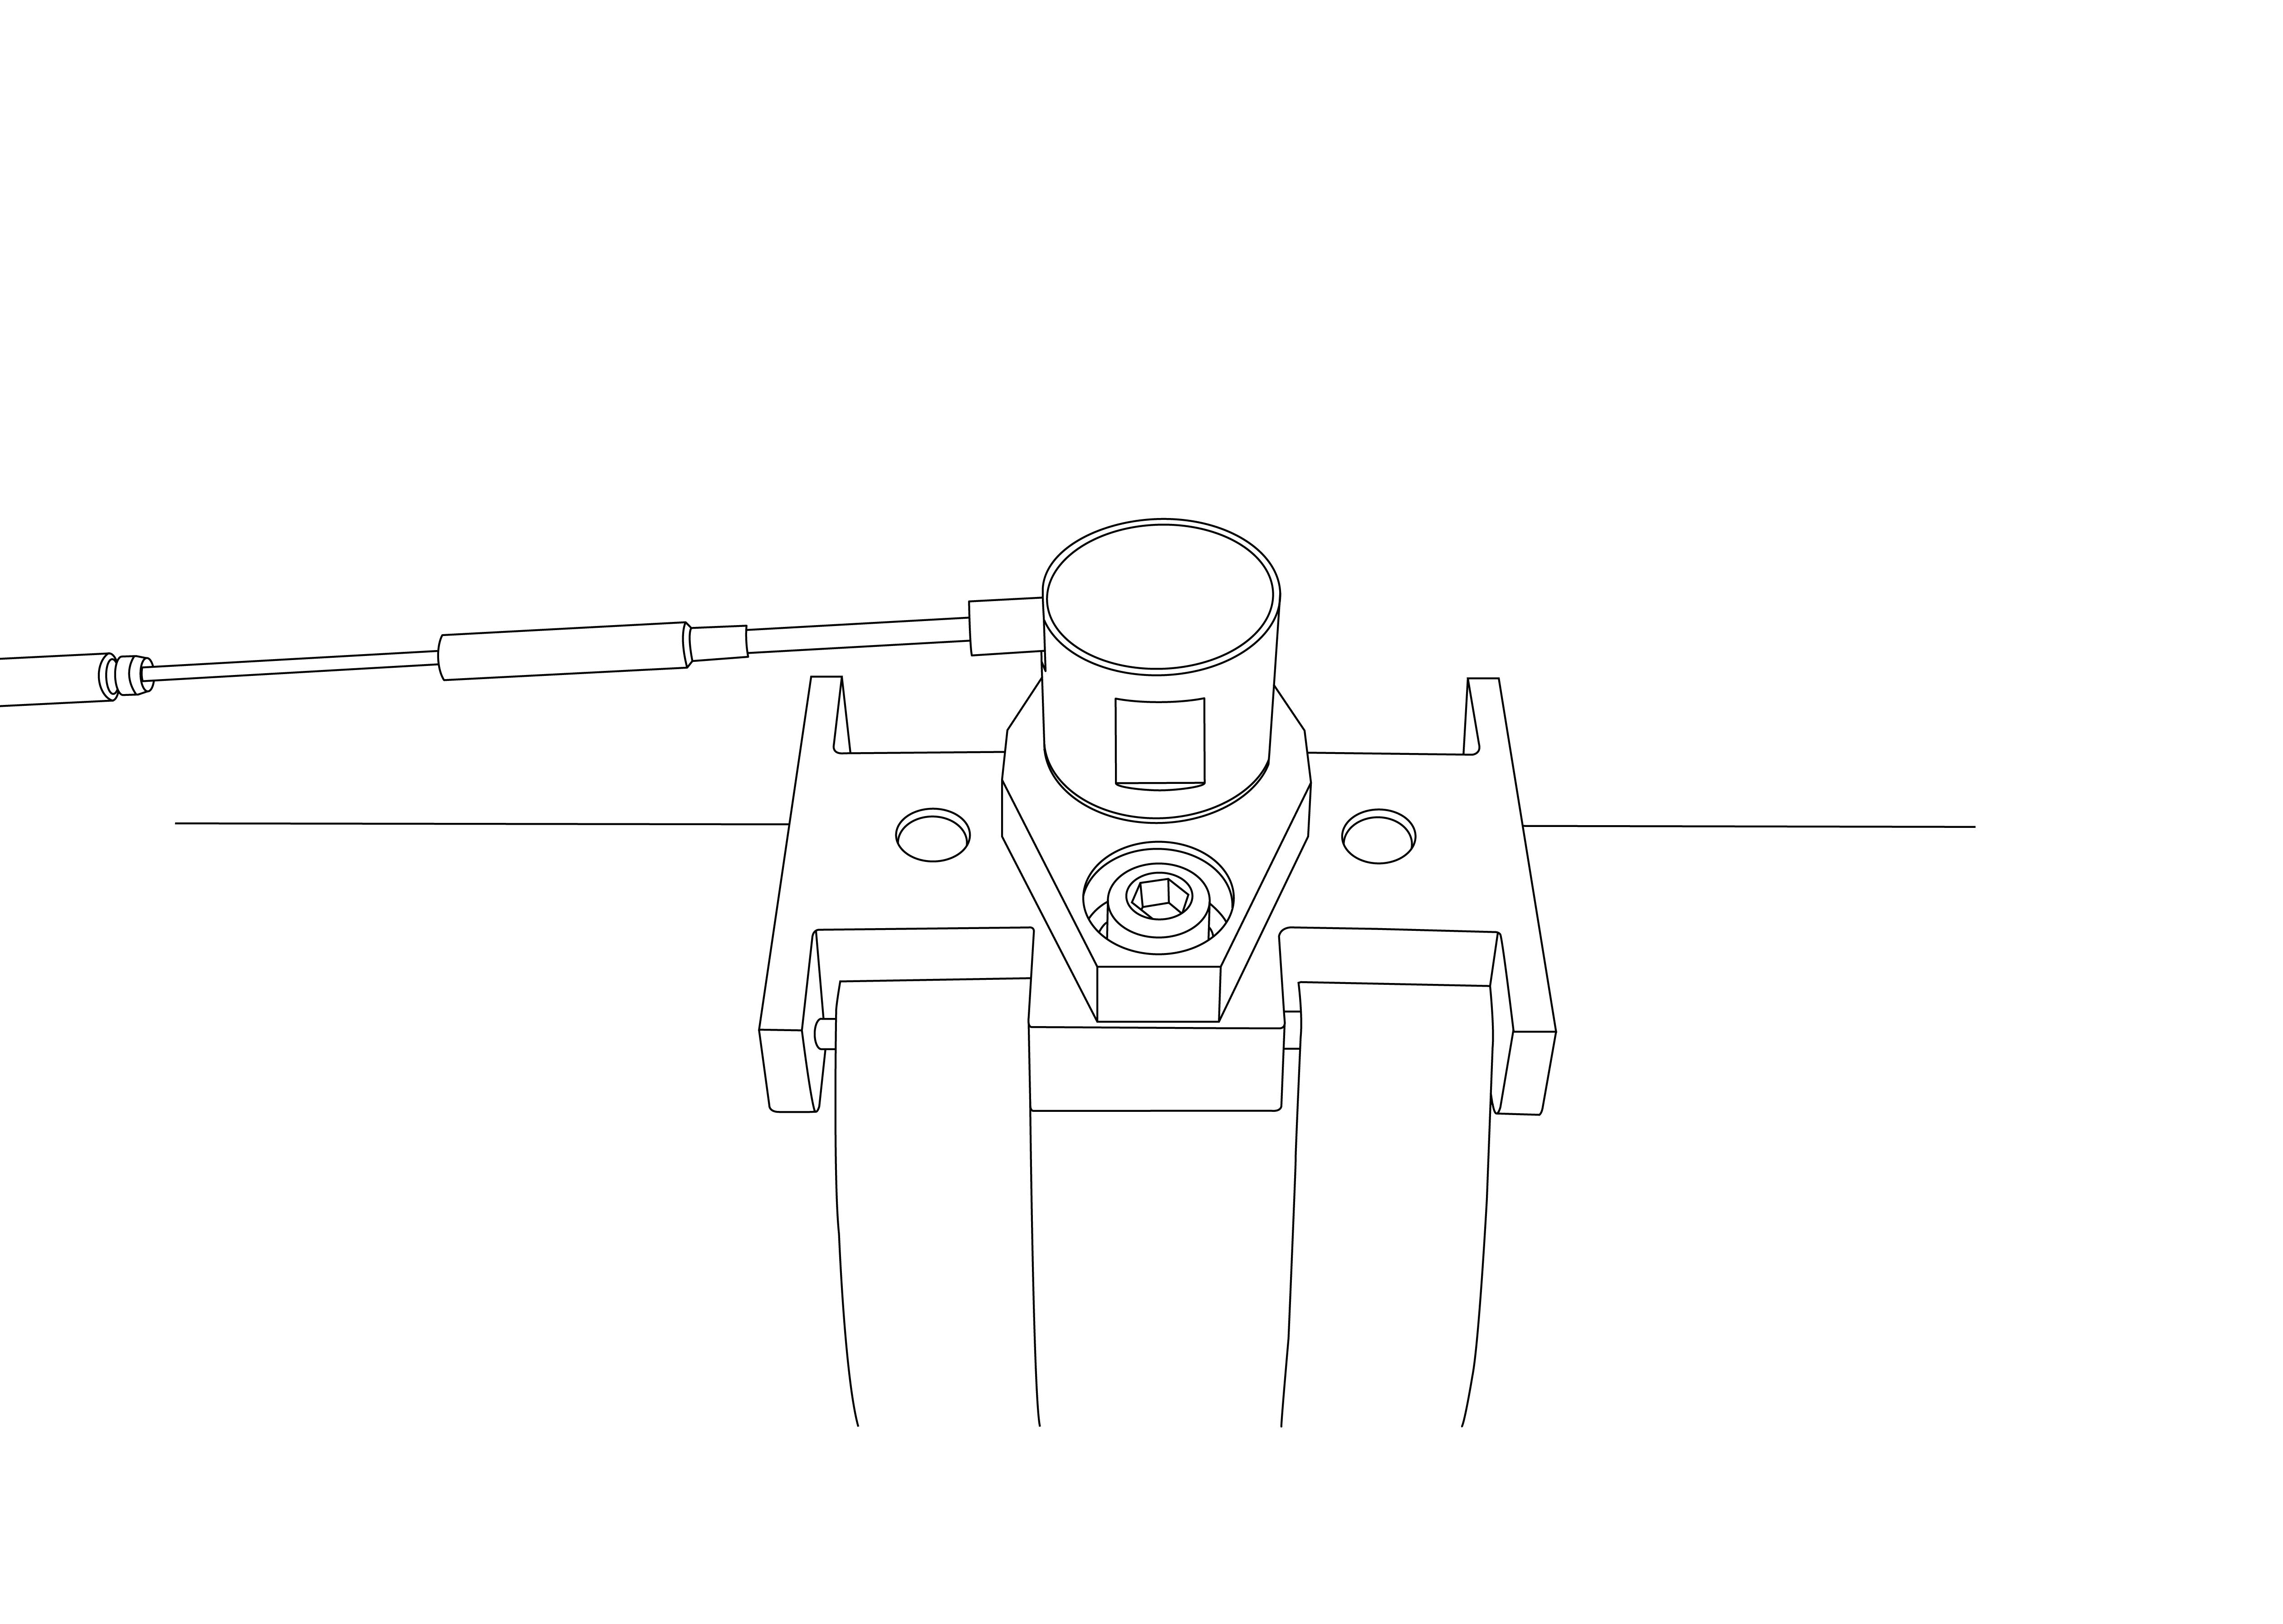 werj-01